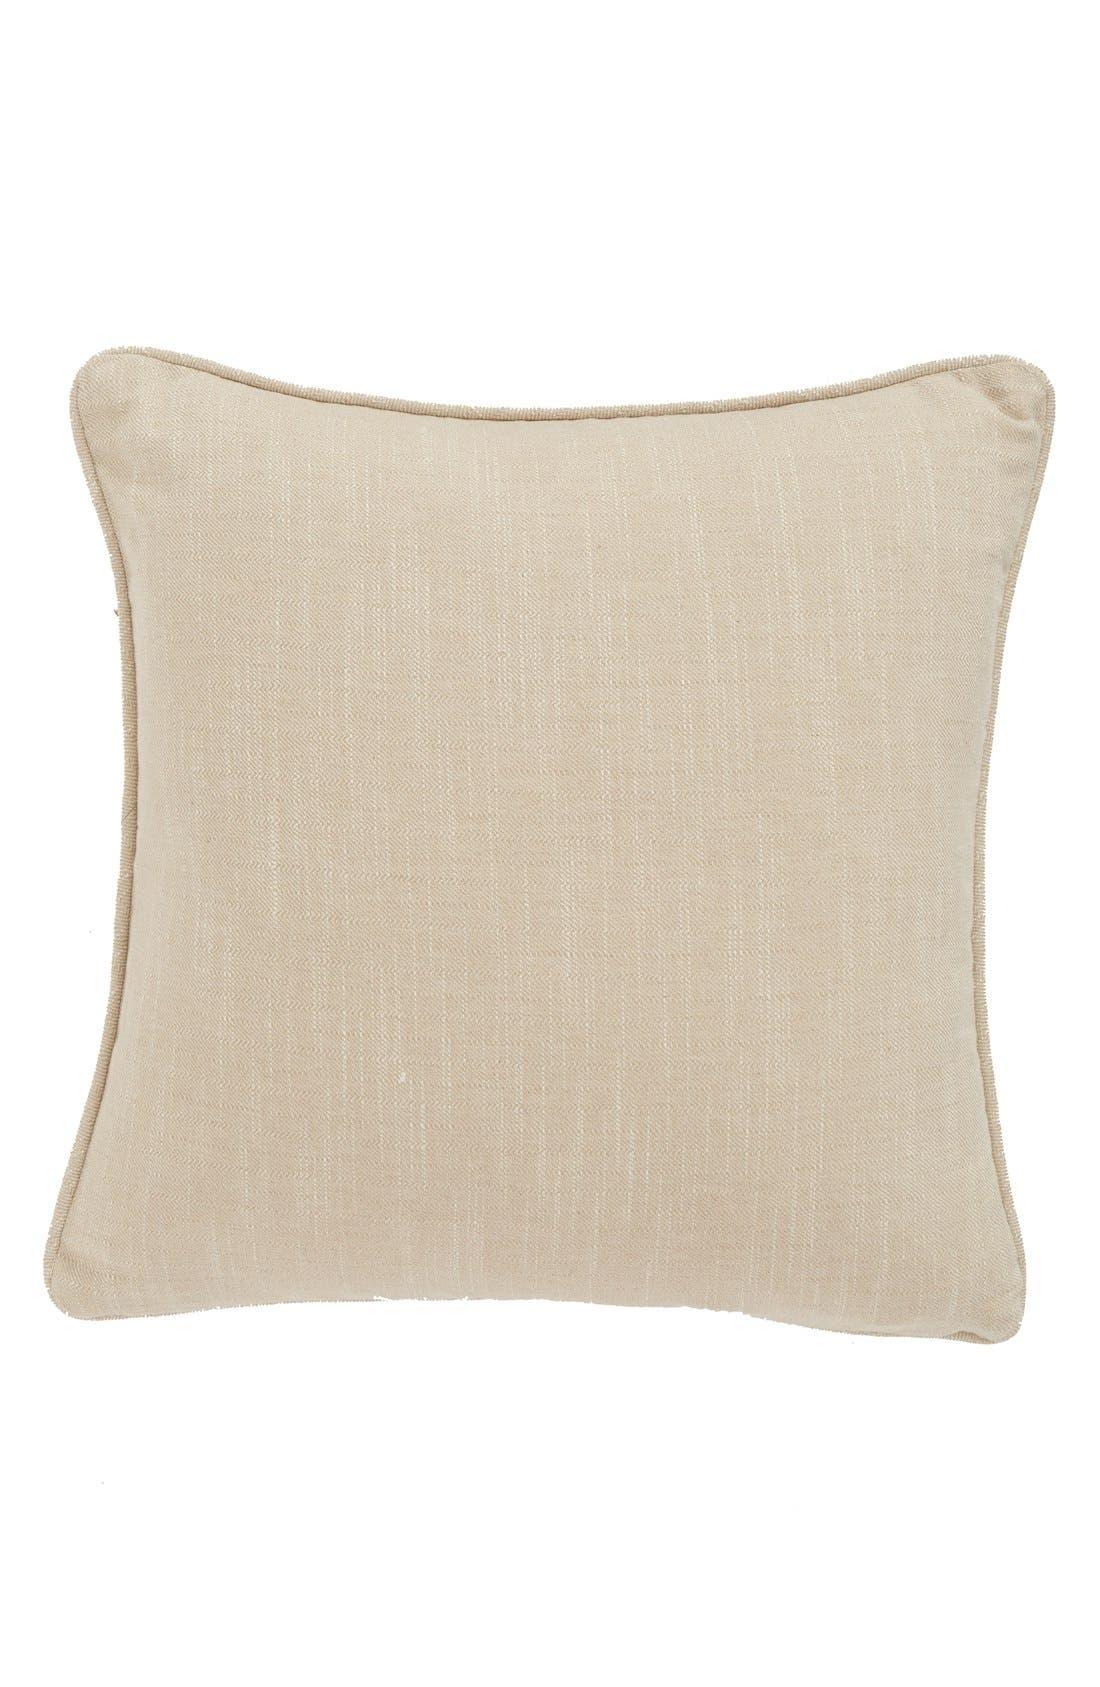 VILLA HOME COLLECTION,                             'Lona' Sequin Accent Pillow,                             Alternate thumbnail 2, color,                             650